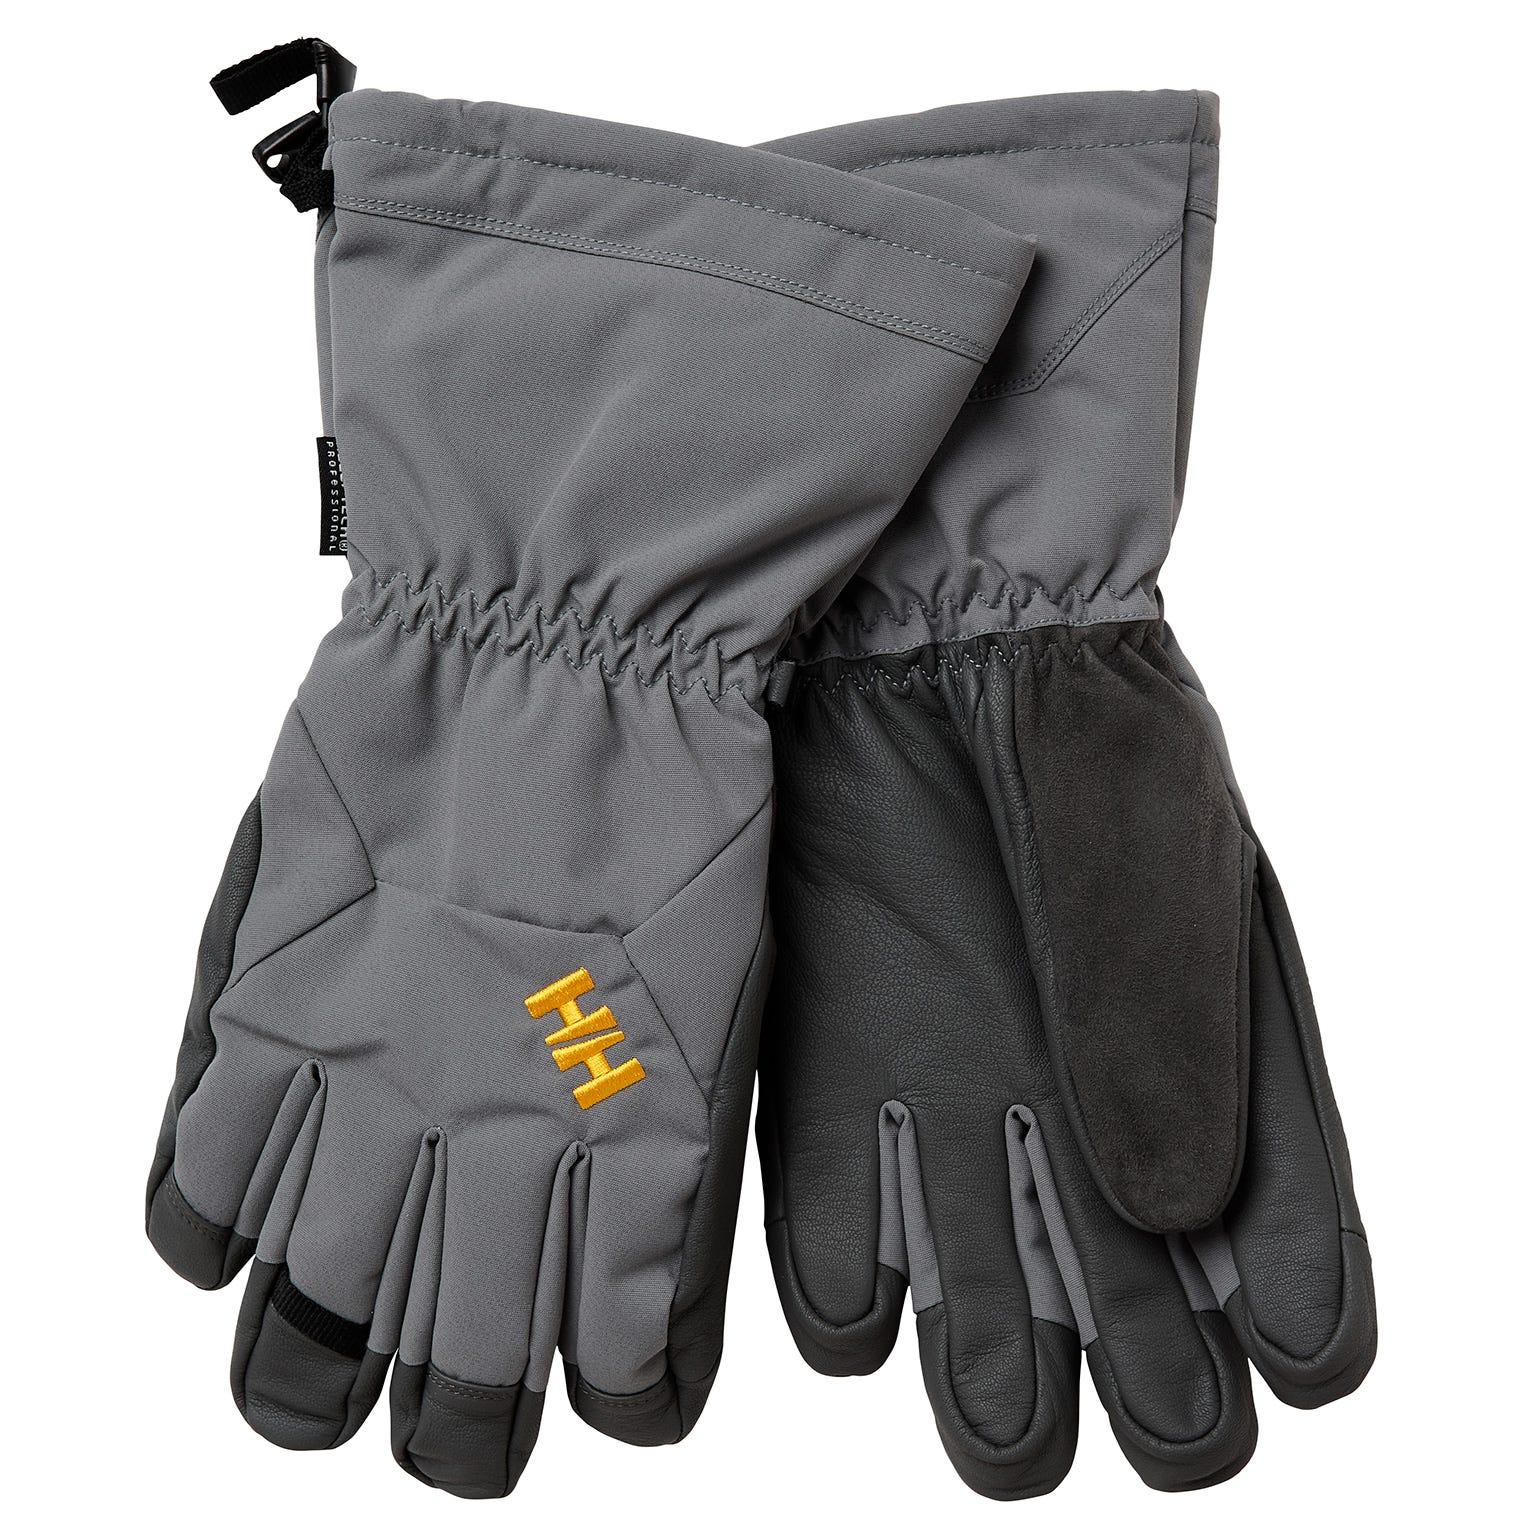 Helly Hansen Odin Gloves Mens Grey XS